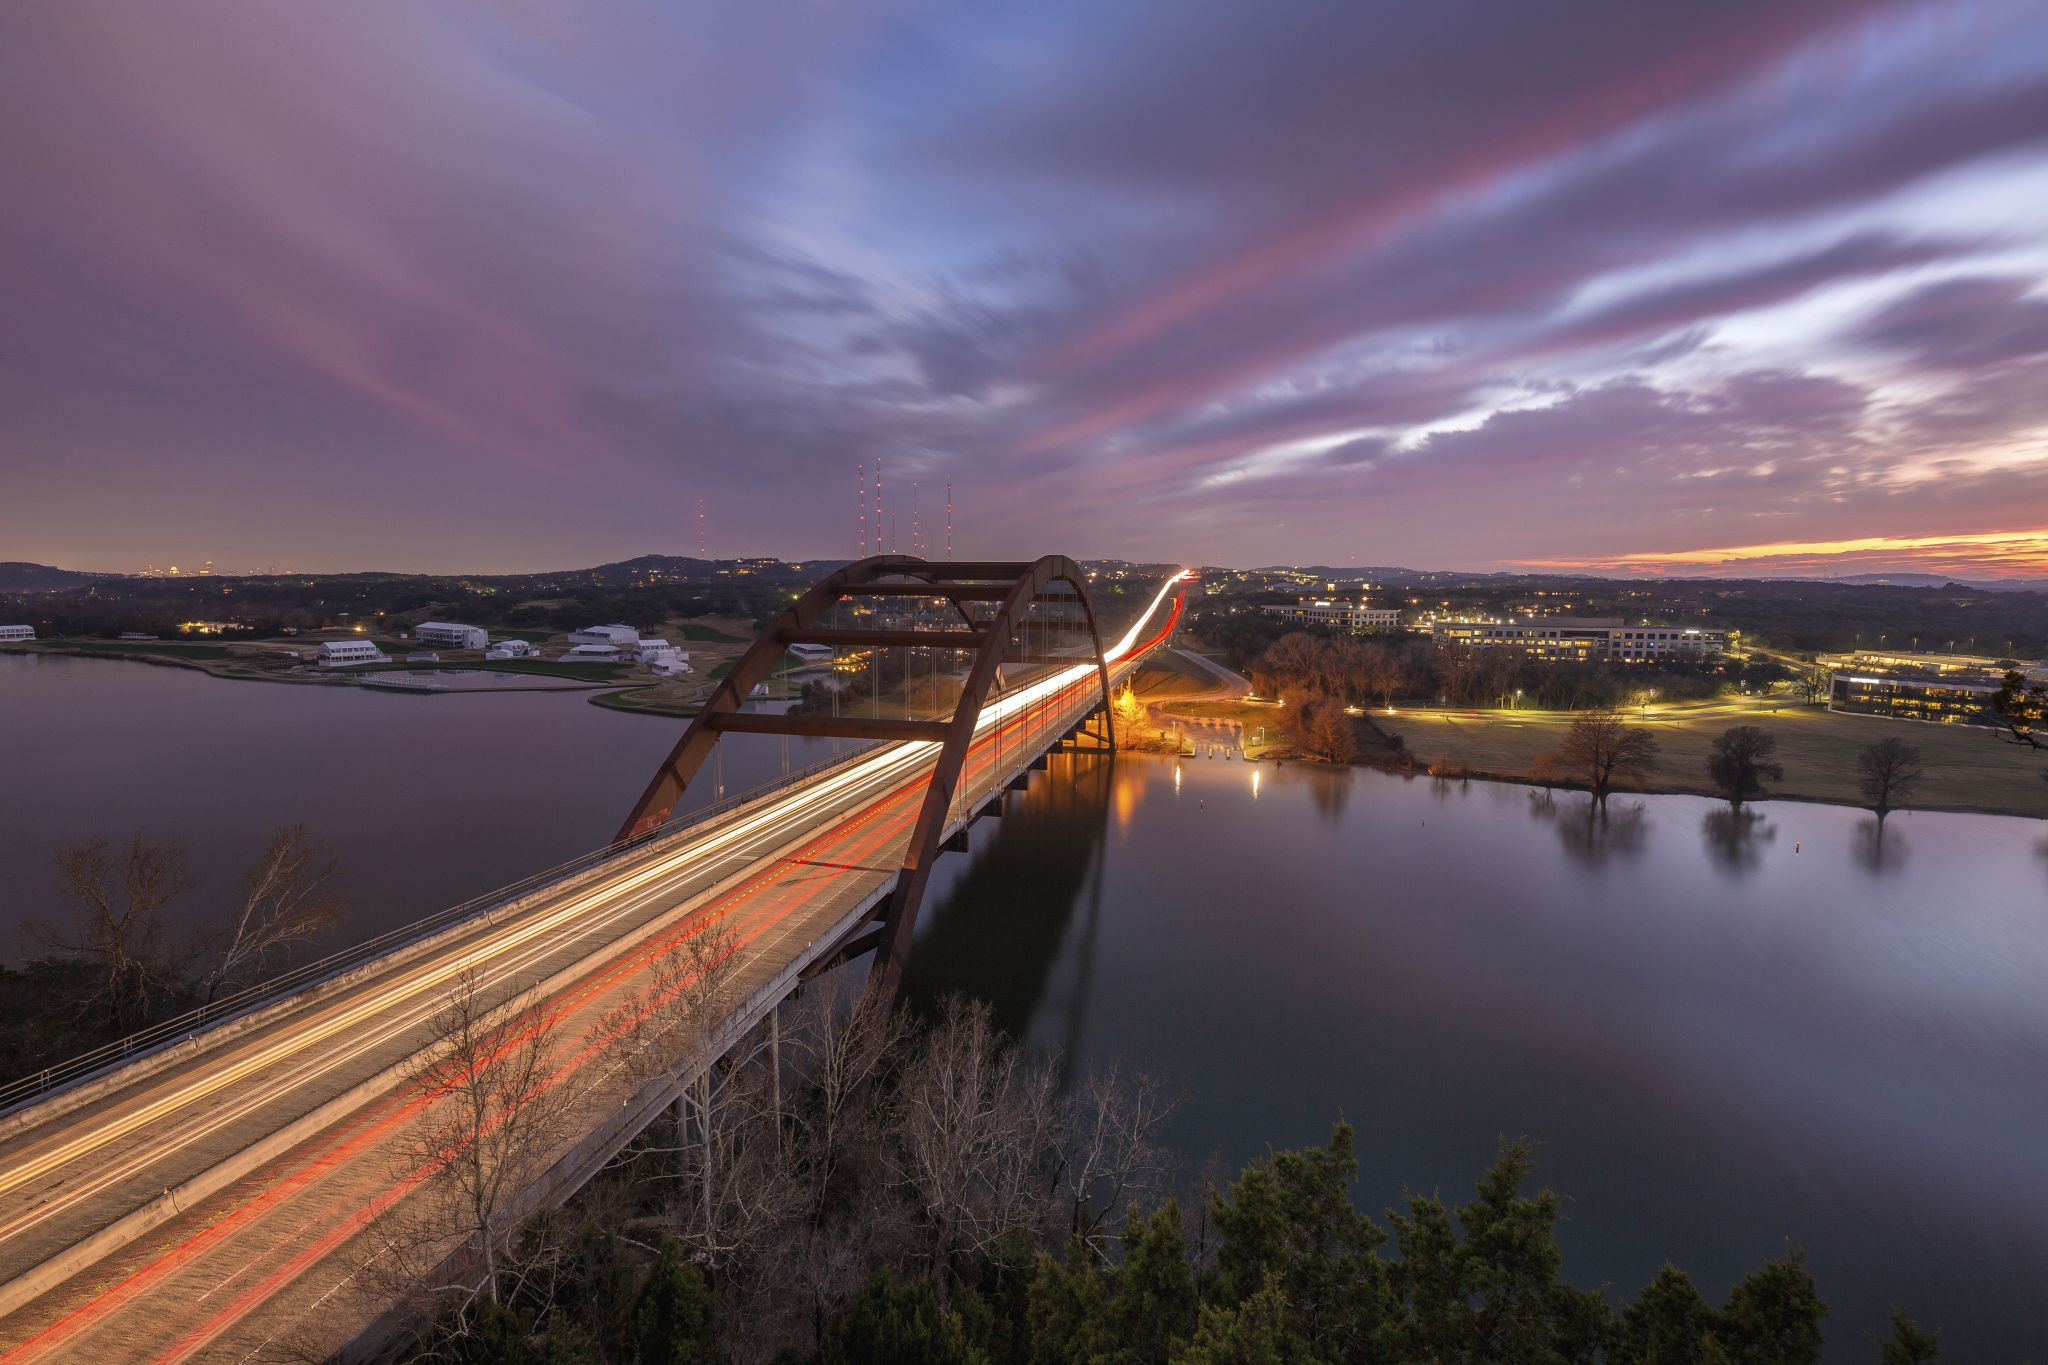 Pennybacker Bridge, USA